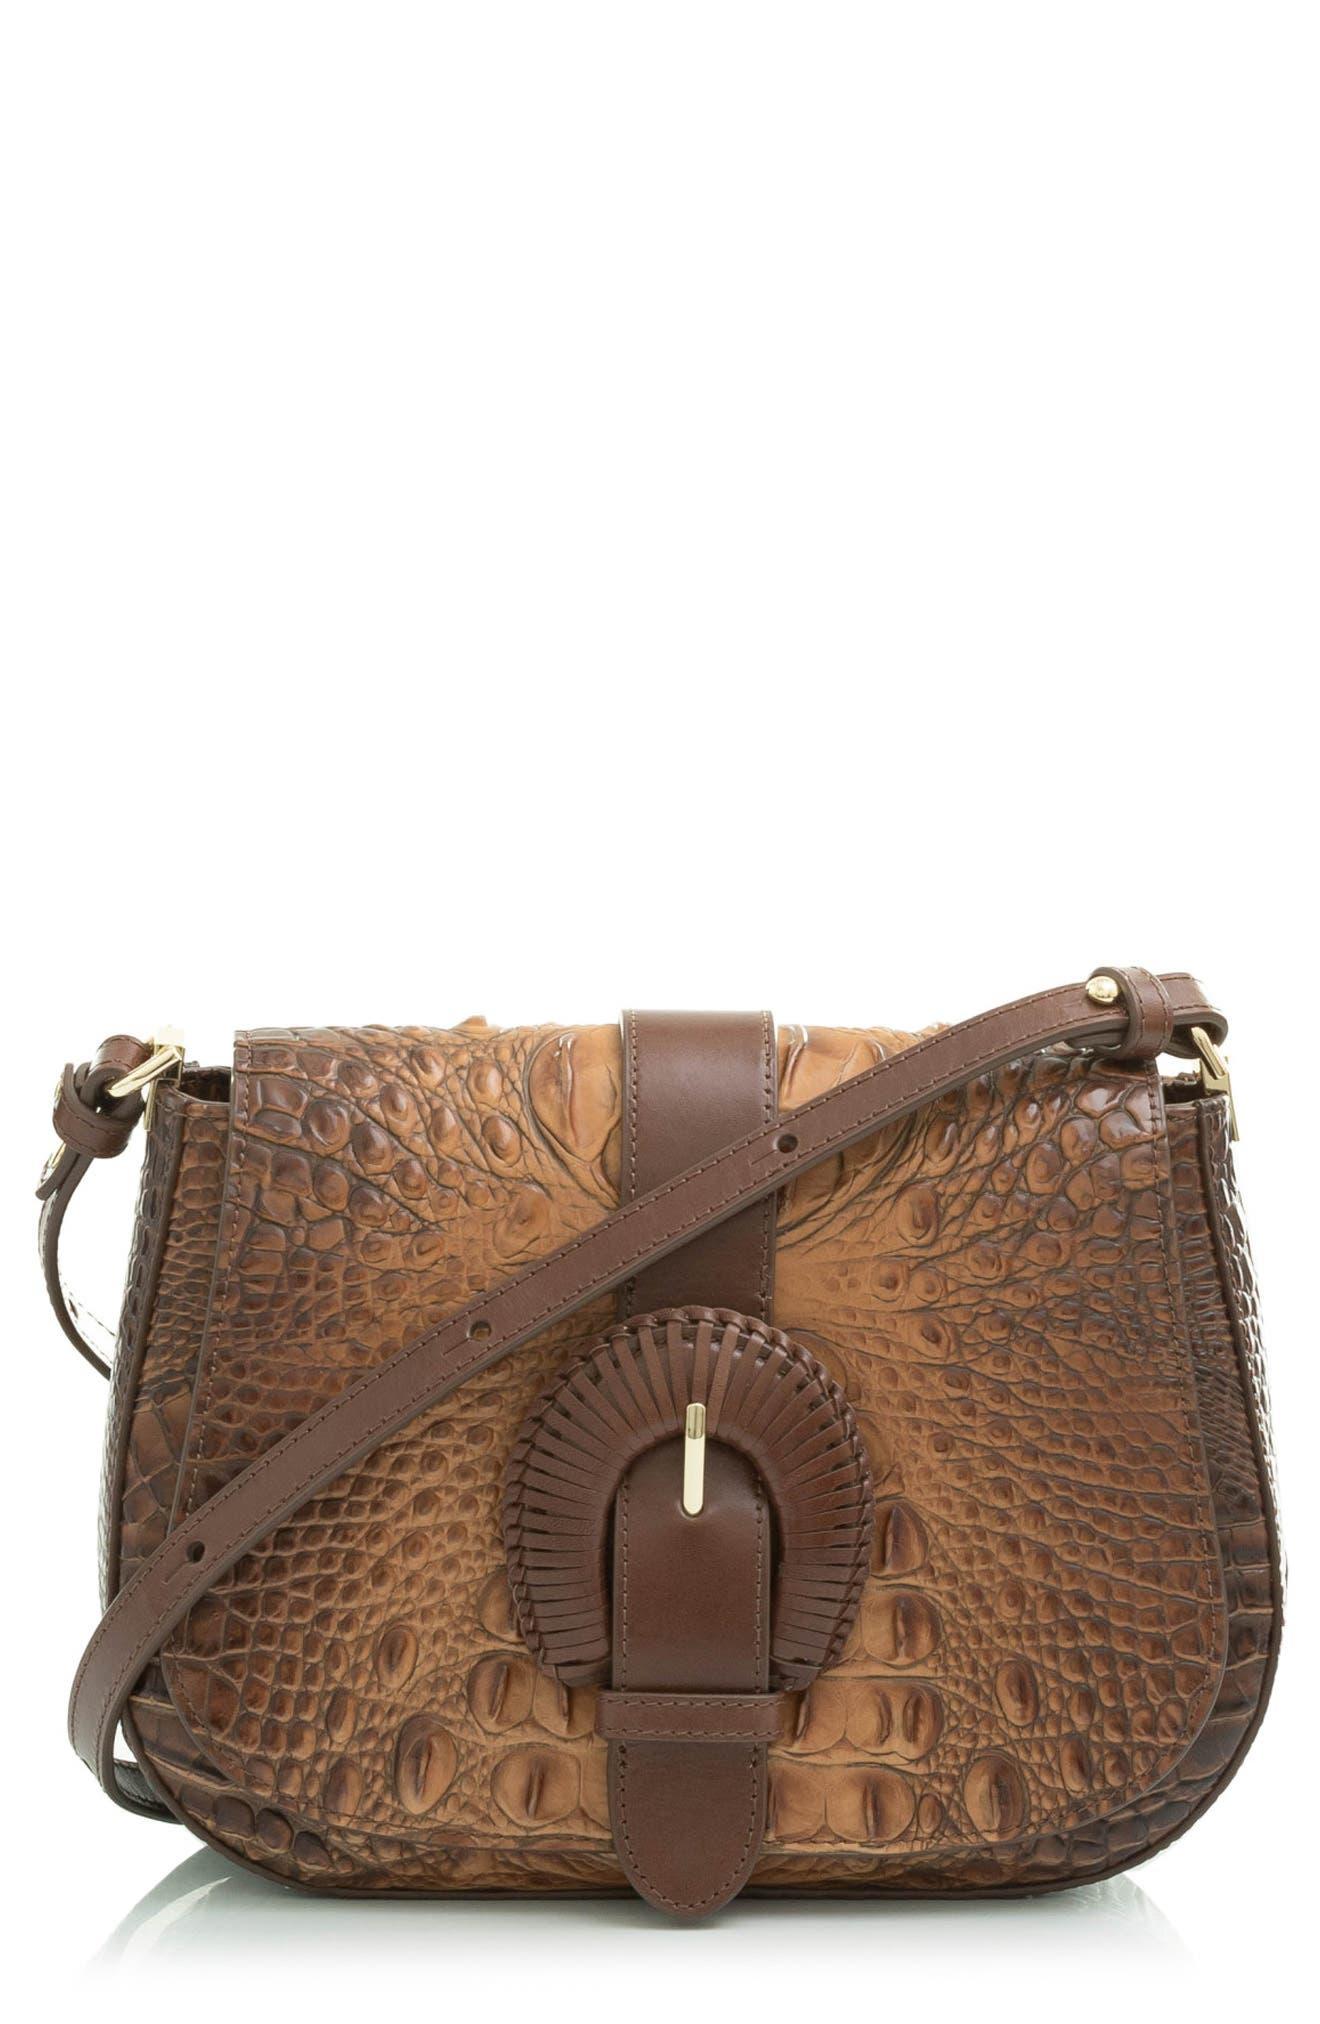 Nadine Small Leather Crossbody Bag